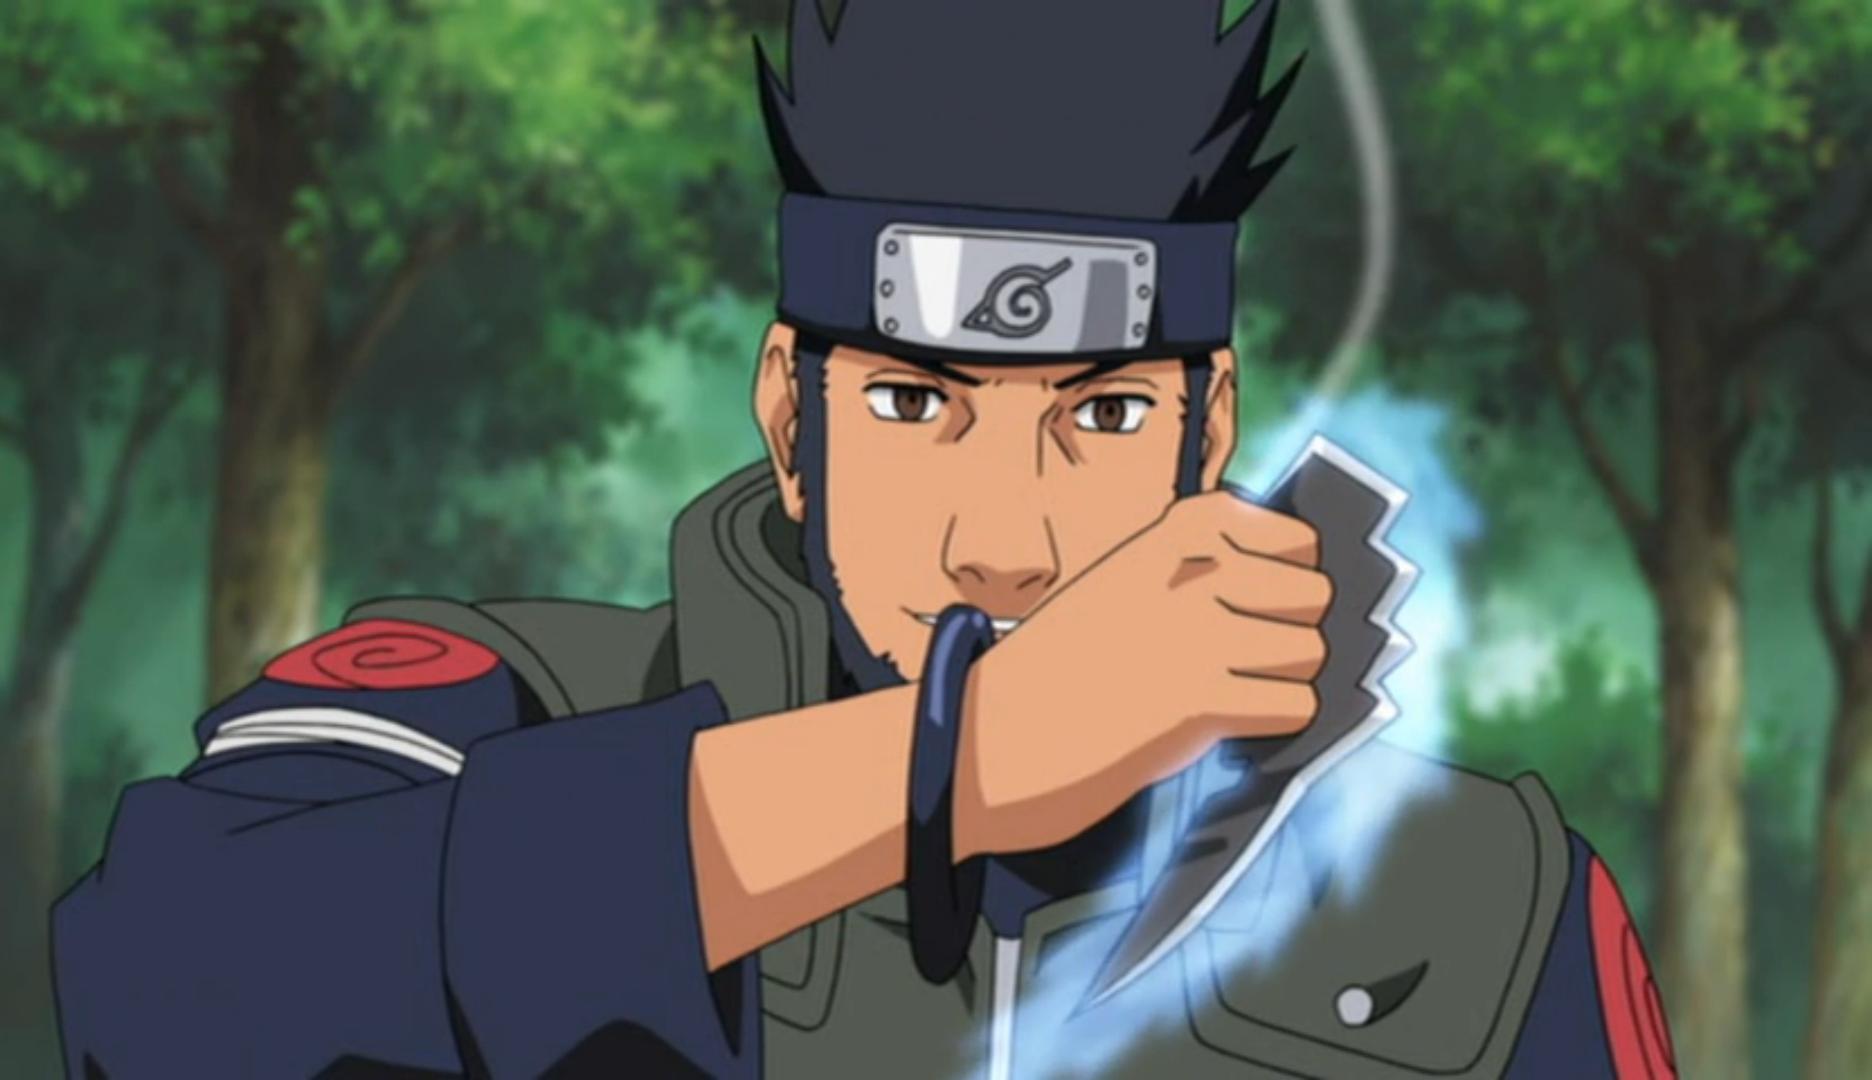 10 Momen Paling Menyedihkan Dalam Naruto Pasti Bikin Kamu